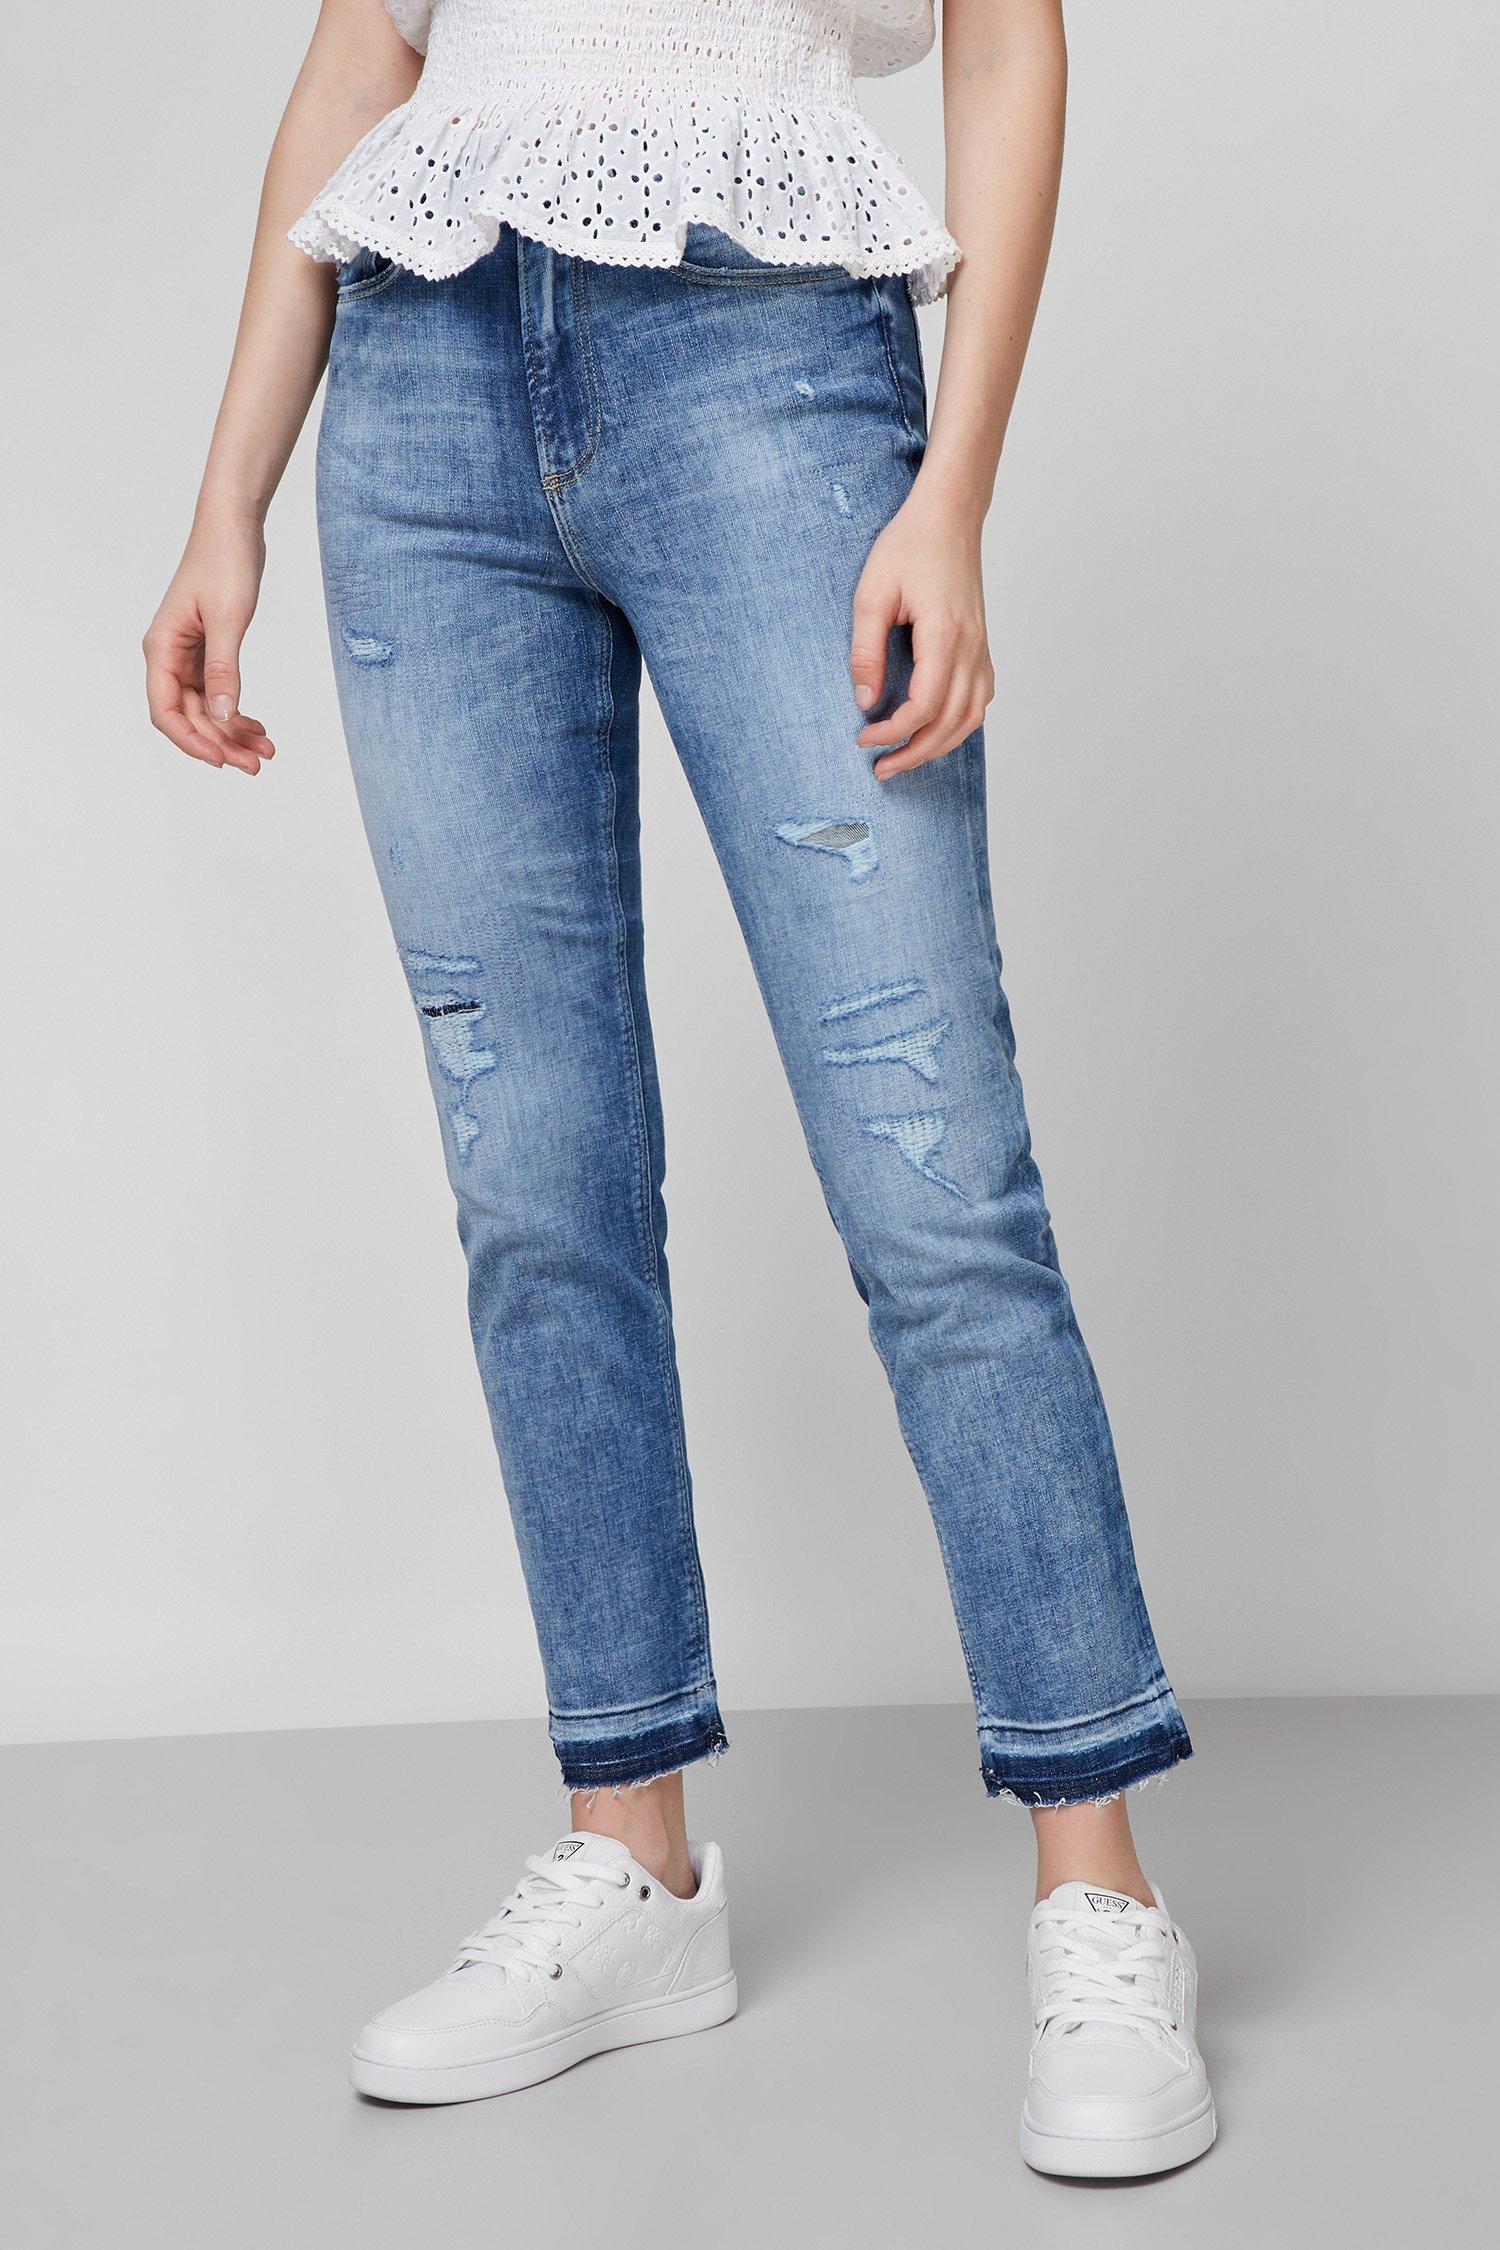 Женские синие джинсы Girly Skinny Straight High 1